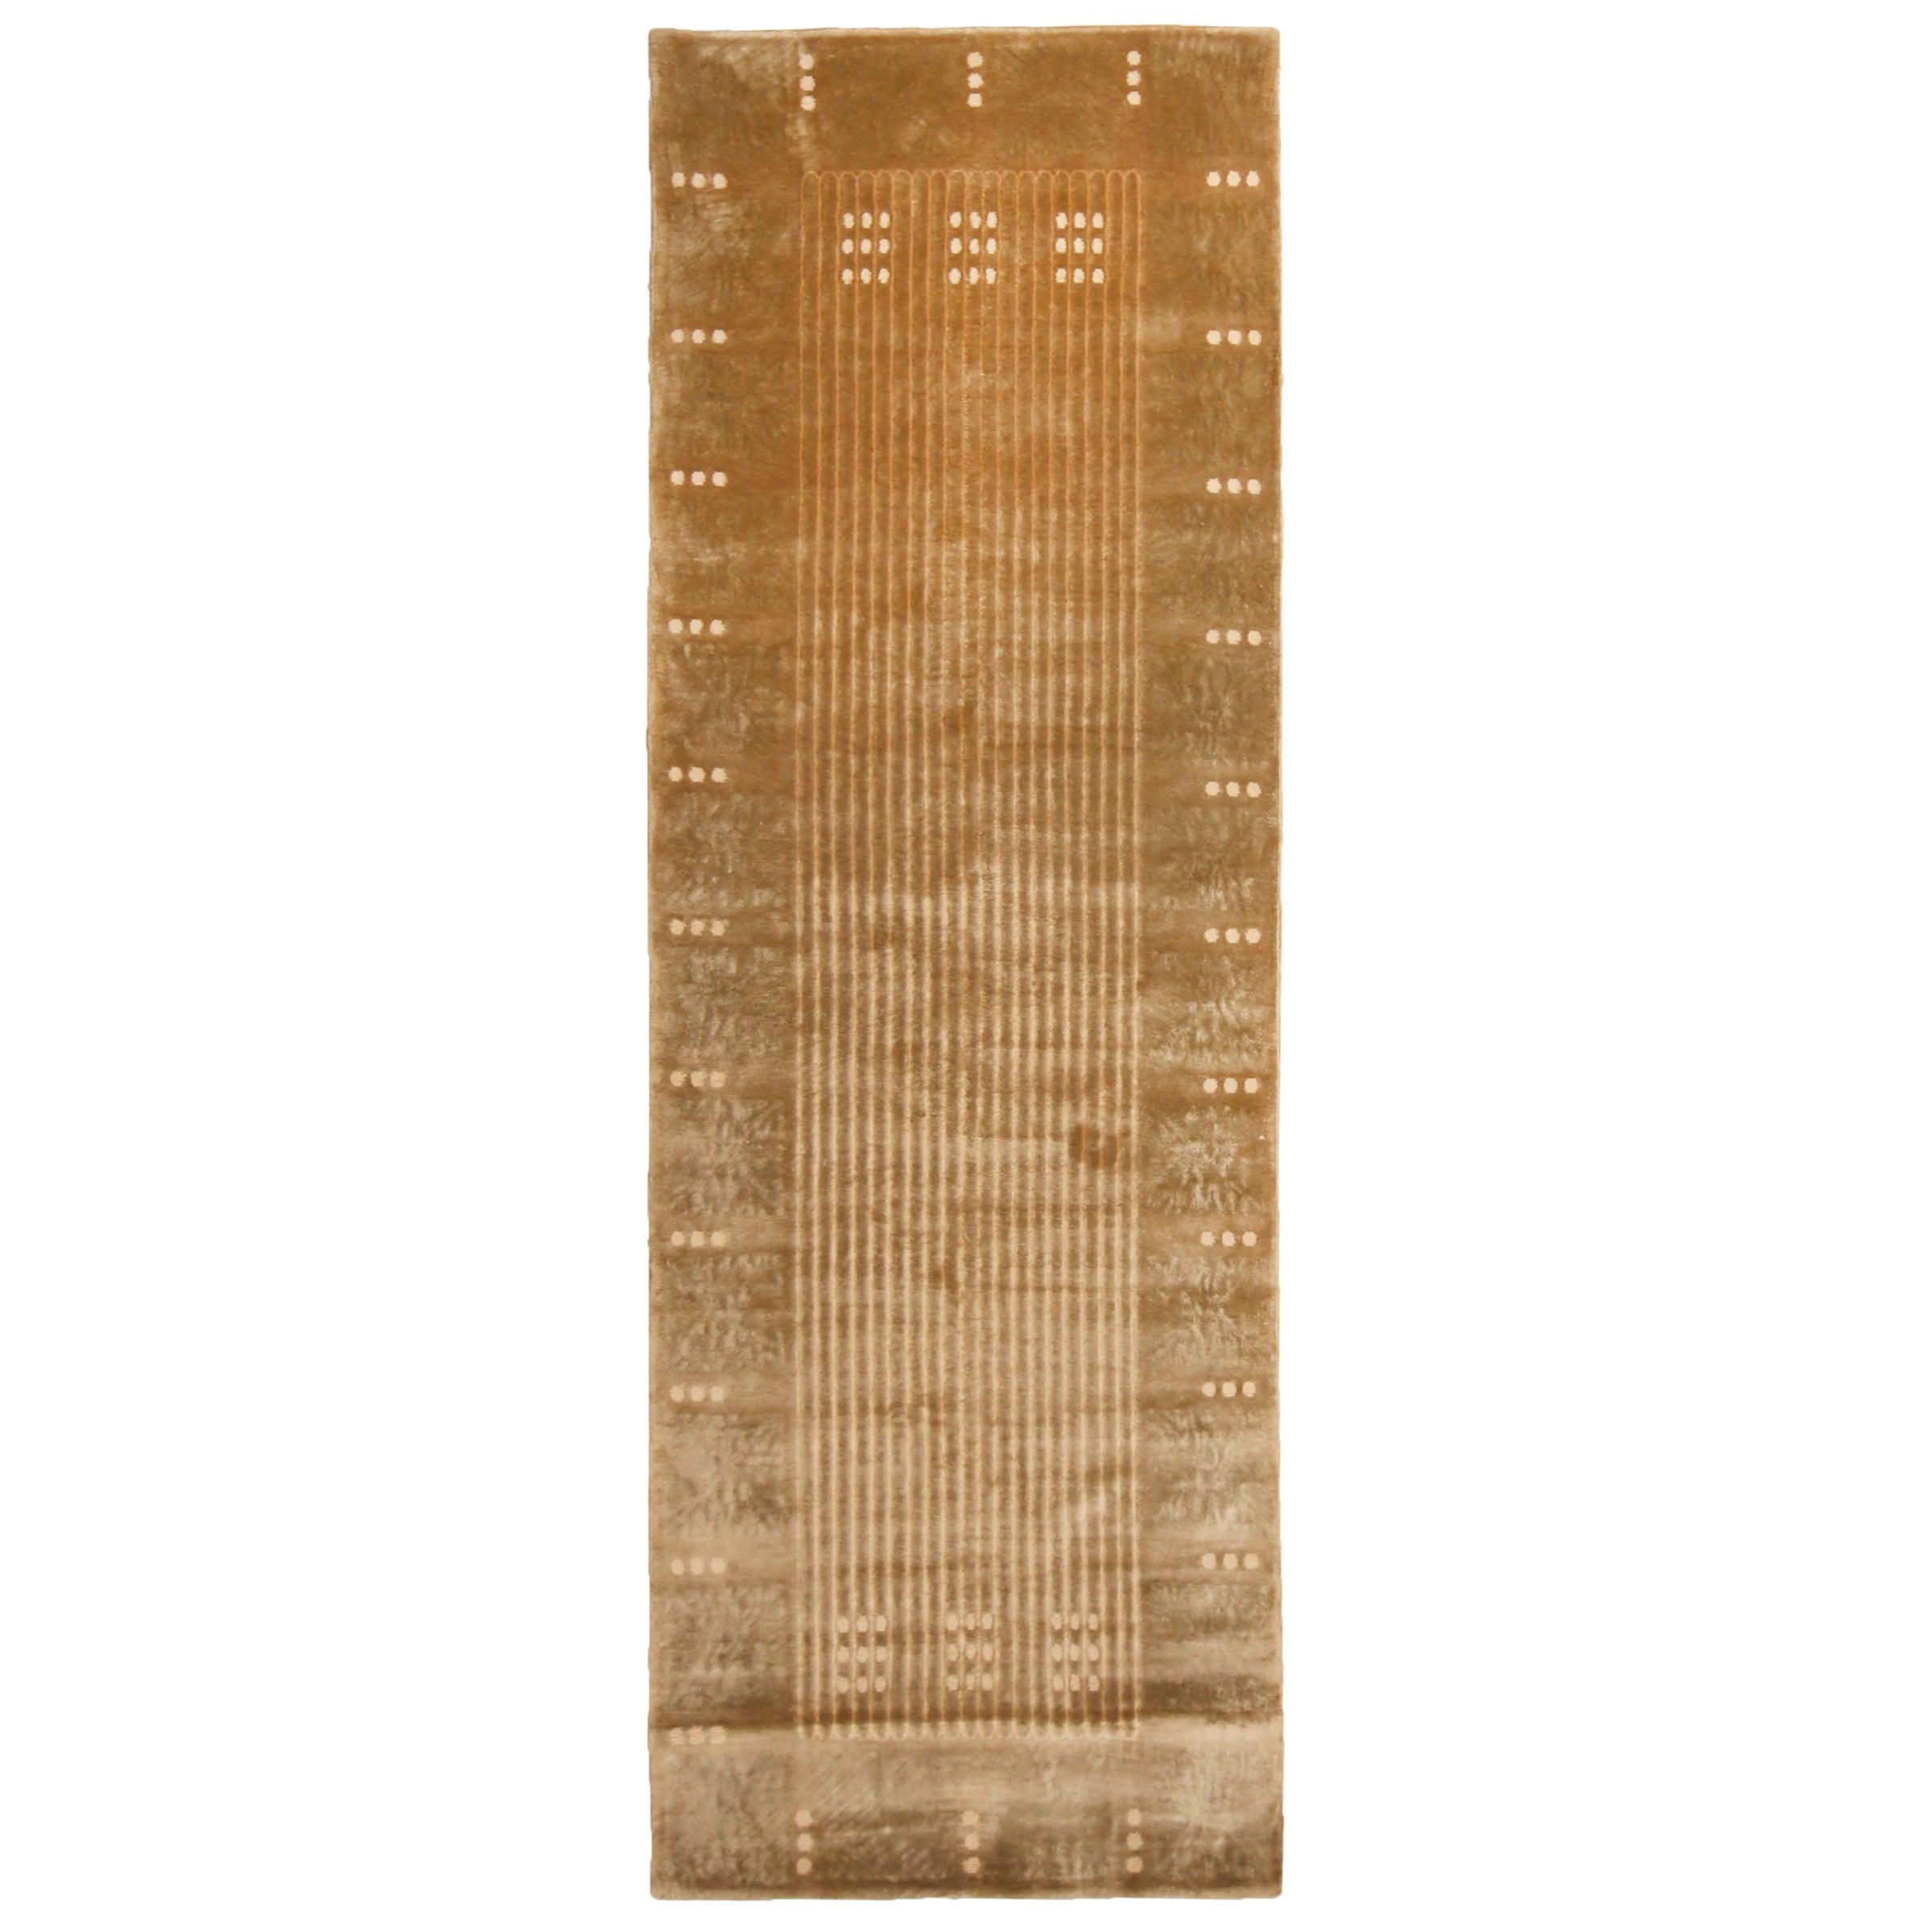 Maze Design Geometric Beige Wool and Silk Runner